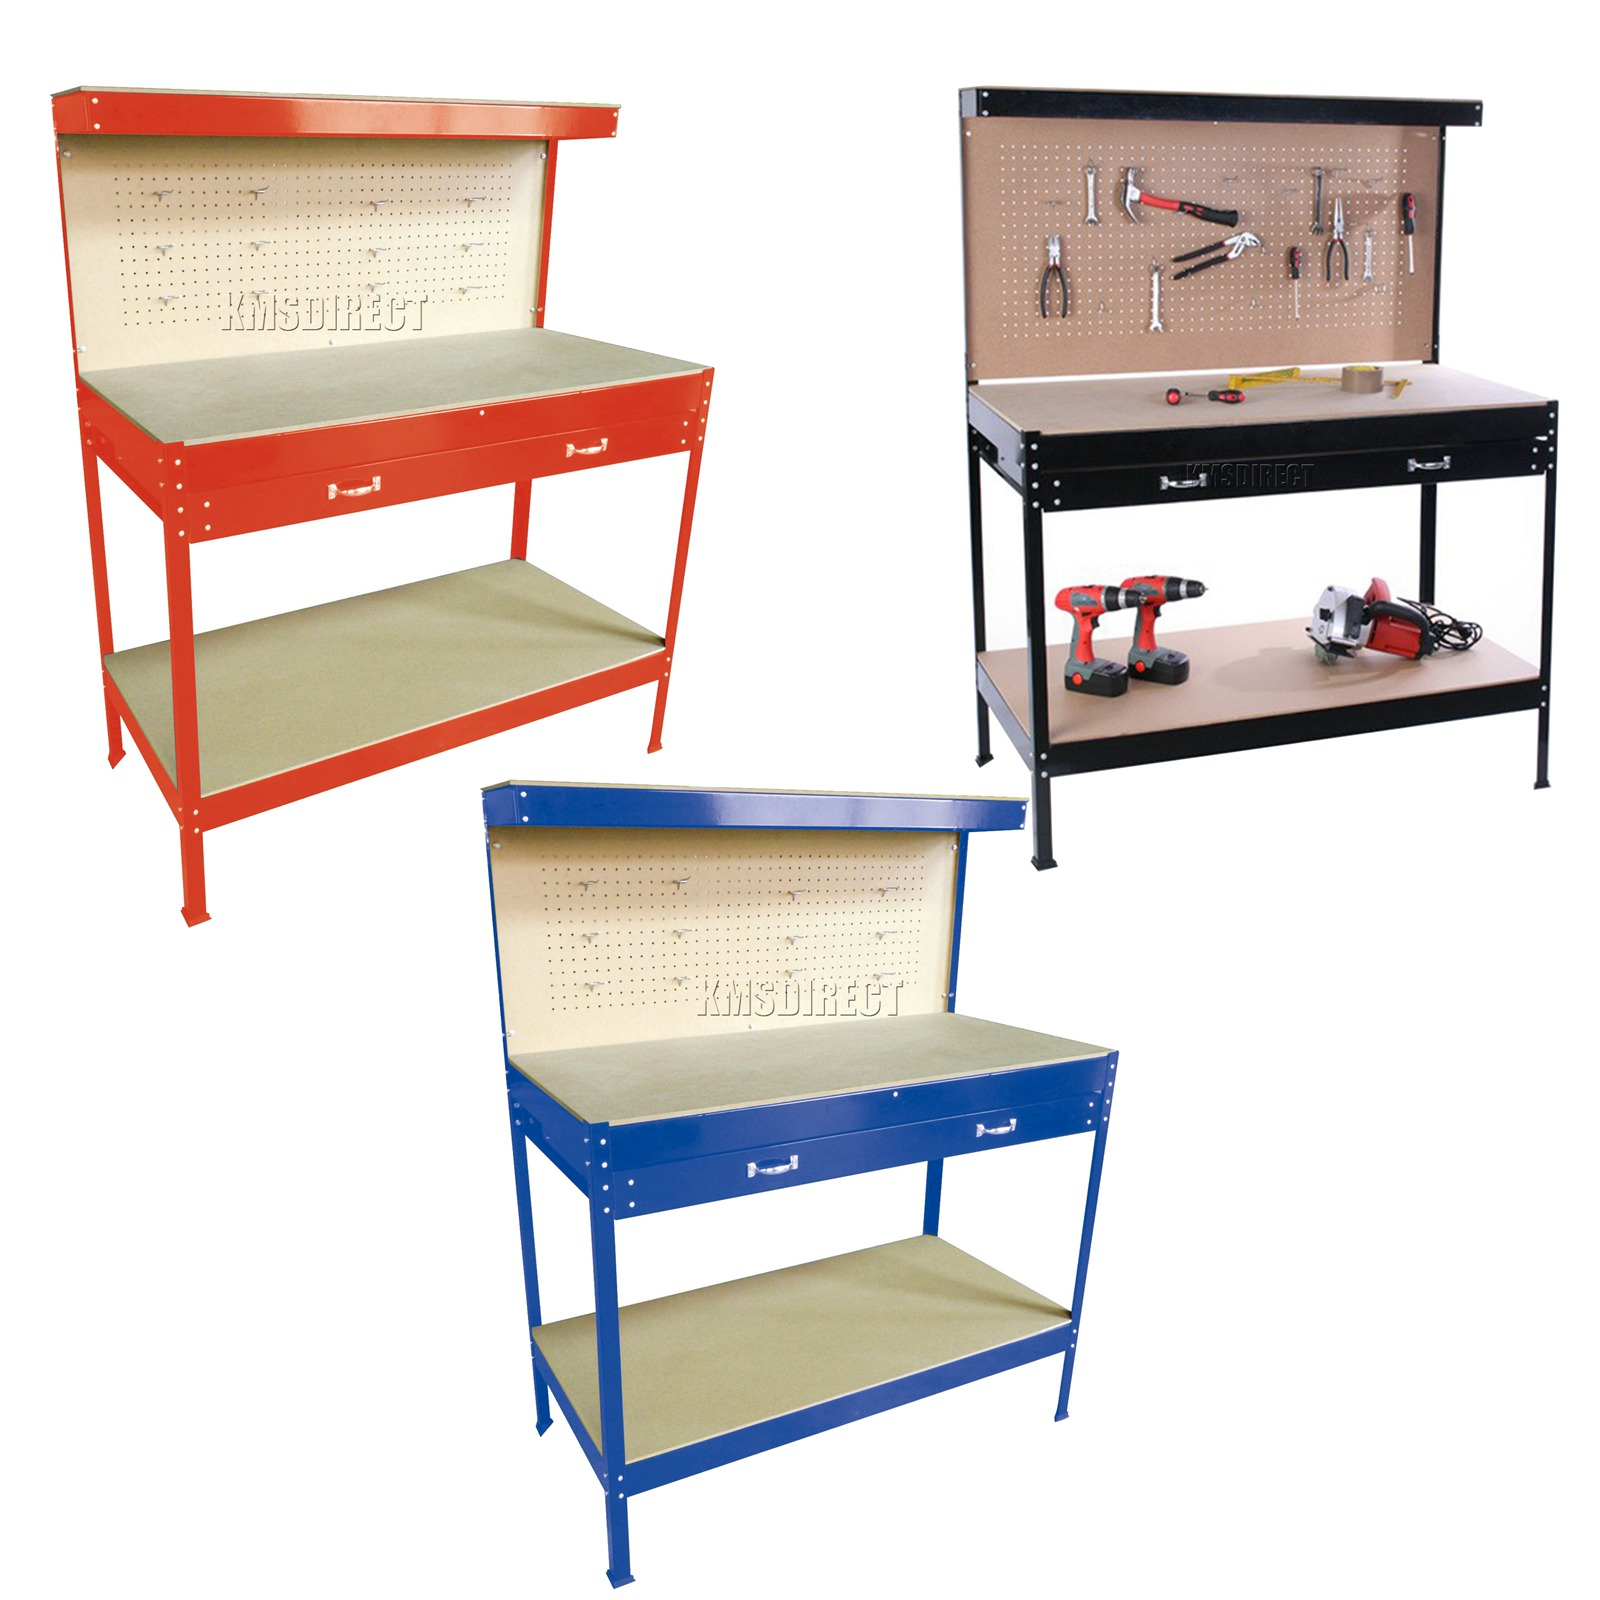 Westwood Steel Garage Tool Box Work Bench Storage Pegboard